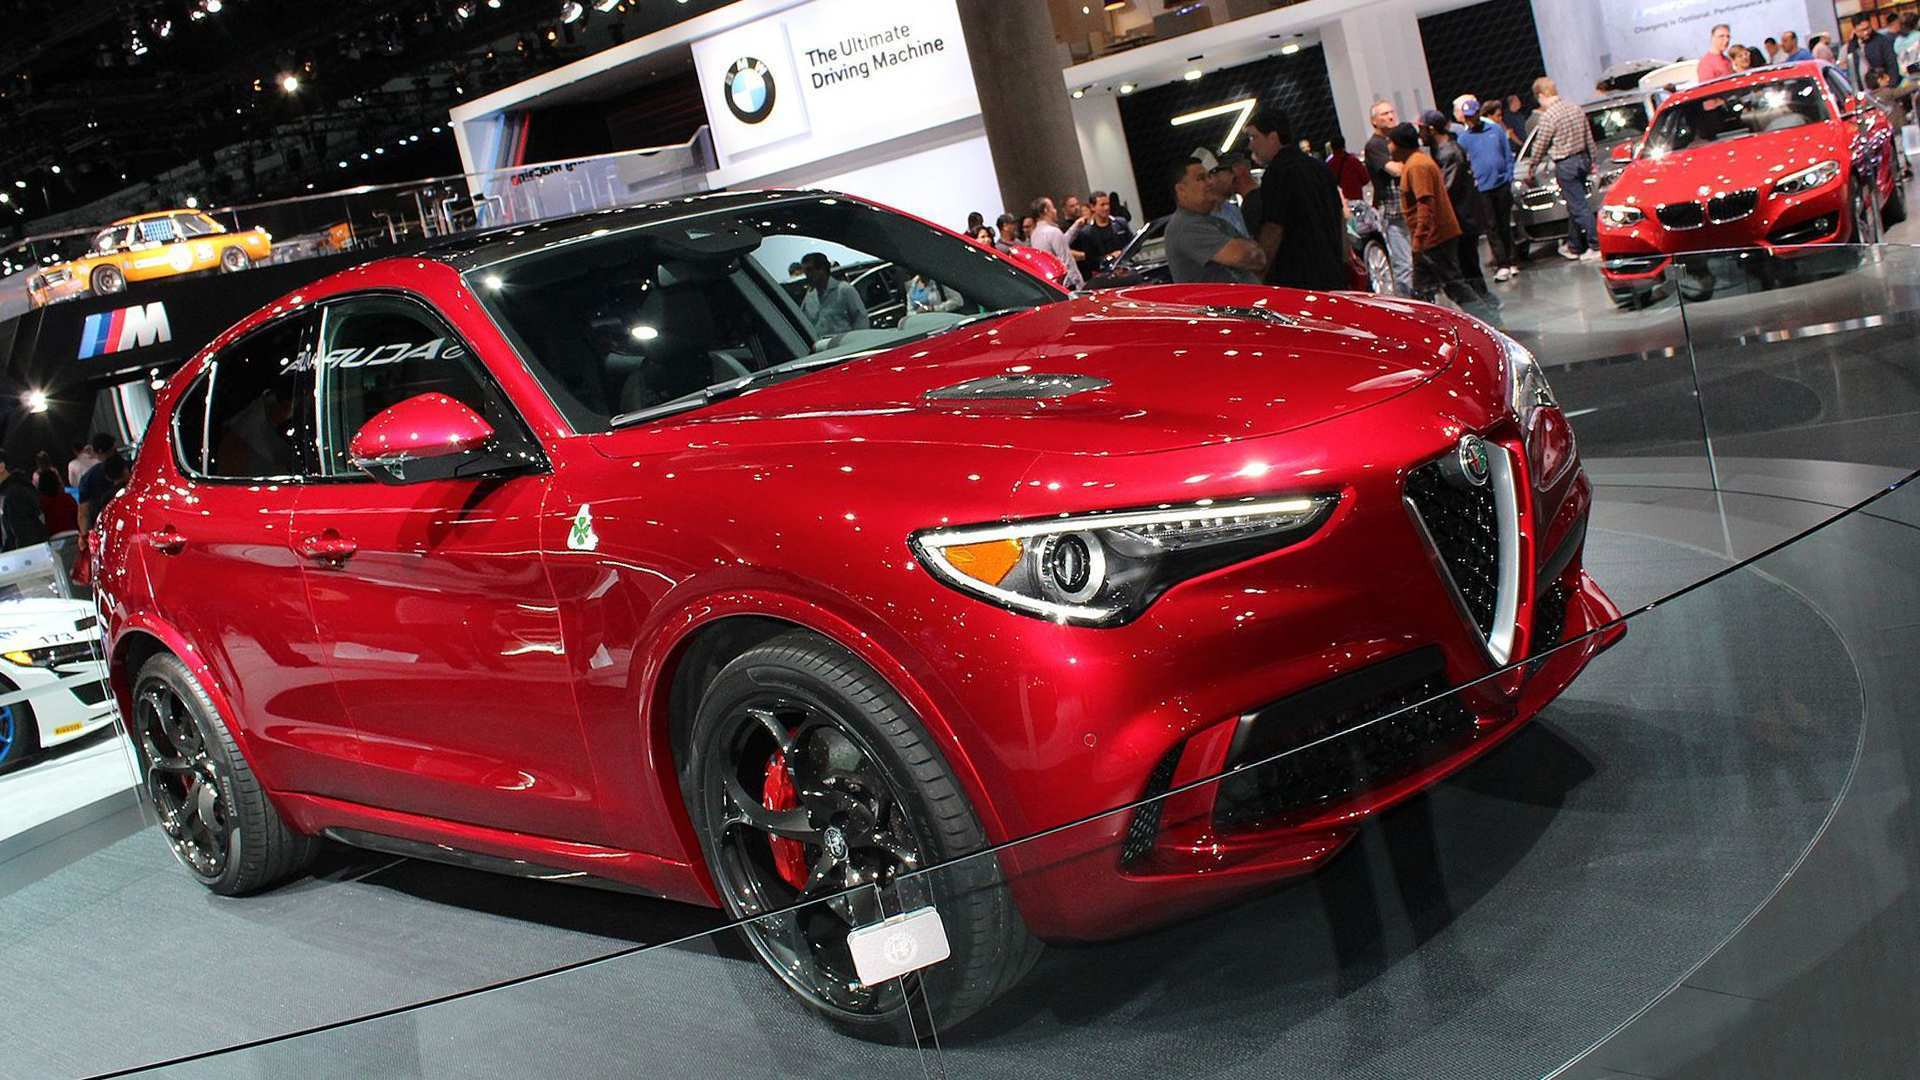 52 Great 2019 Alfa Romeo Stelvio Release Date Research New with 2019 Alfa Romeo Stelvio Release Date